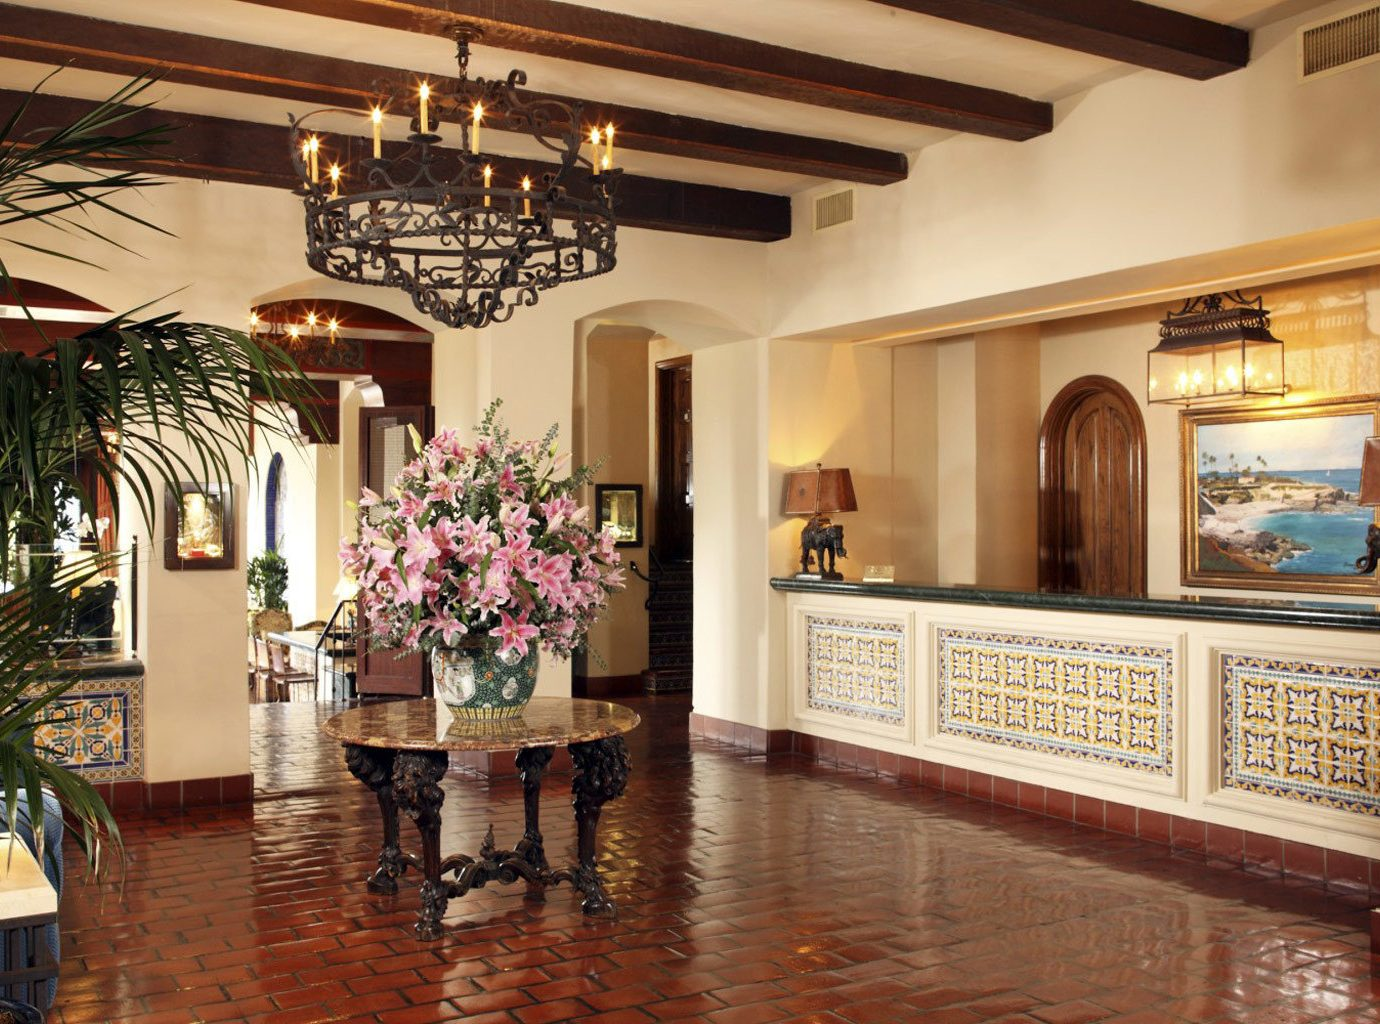 Elegant Hotels Lobby Luxury indoor floor room estate ceiling floristry home interior design mansion aisle Boutique hall several